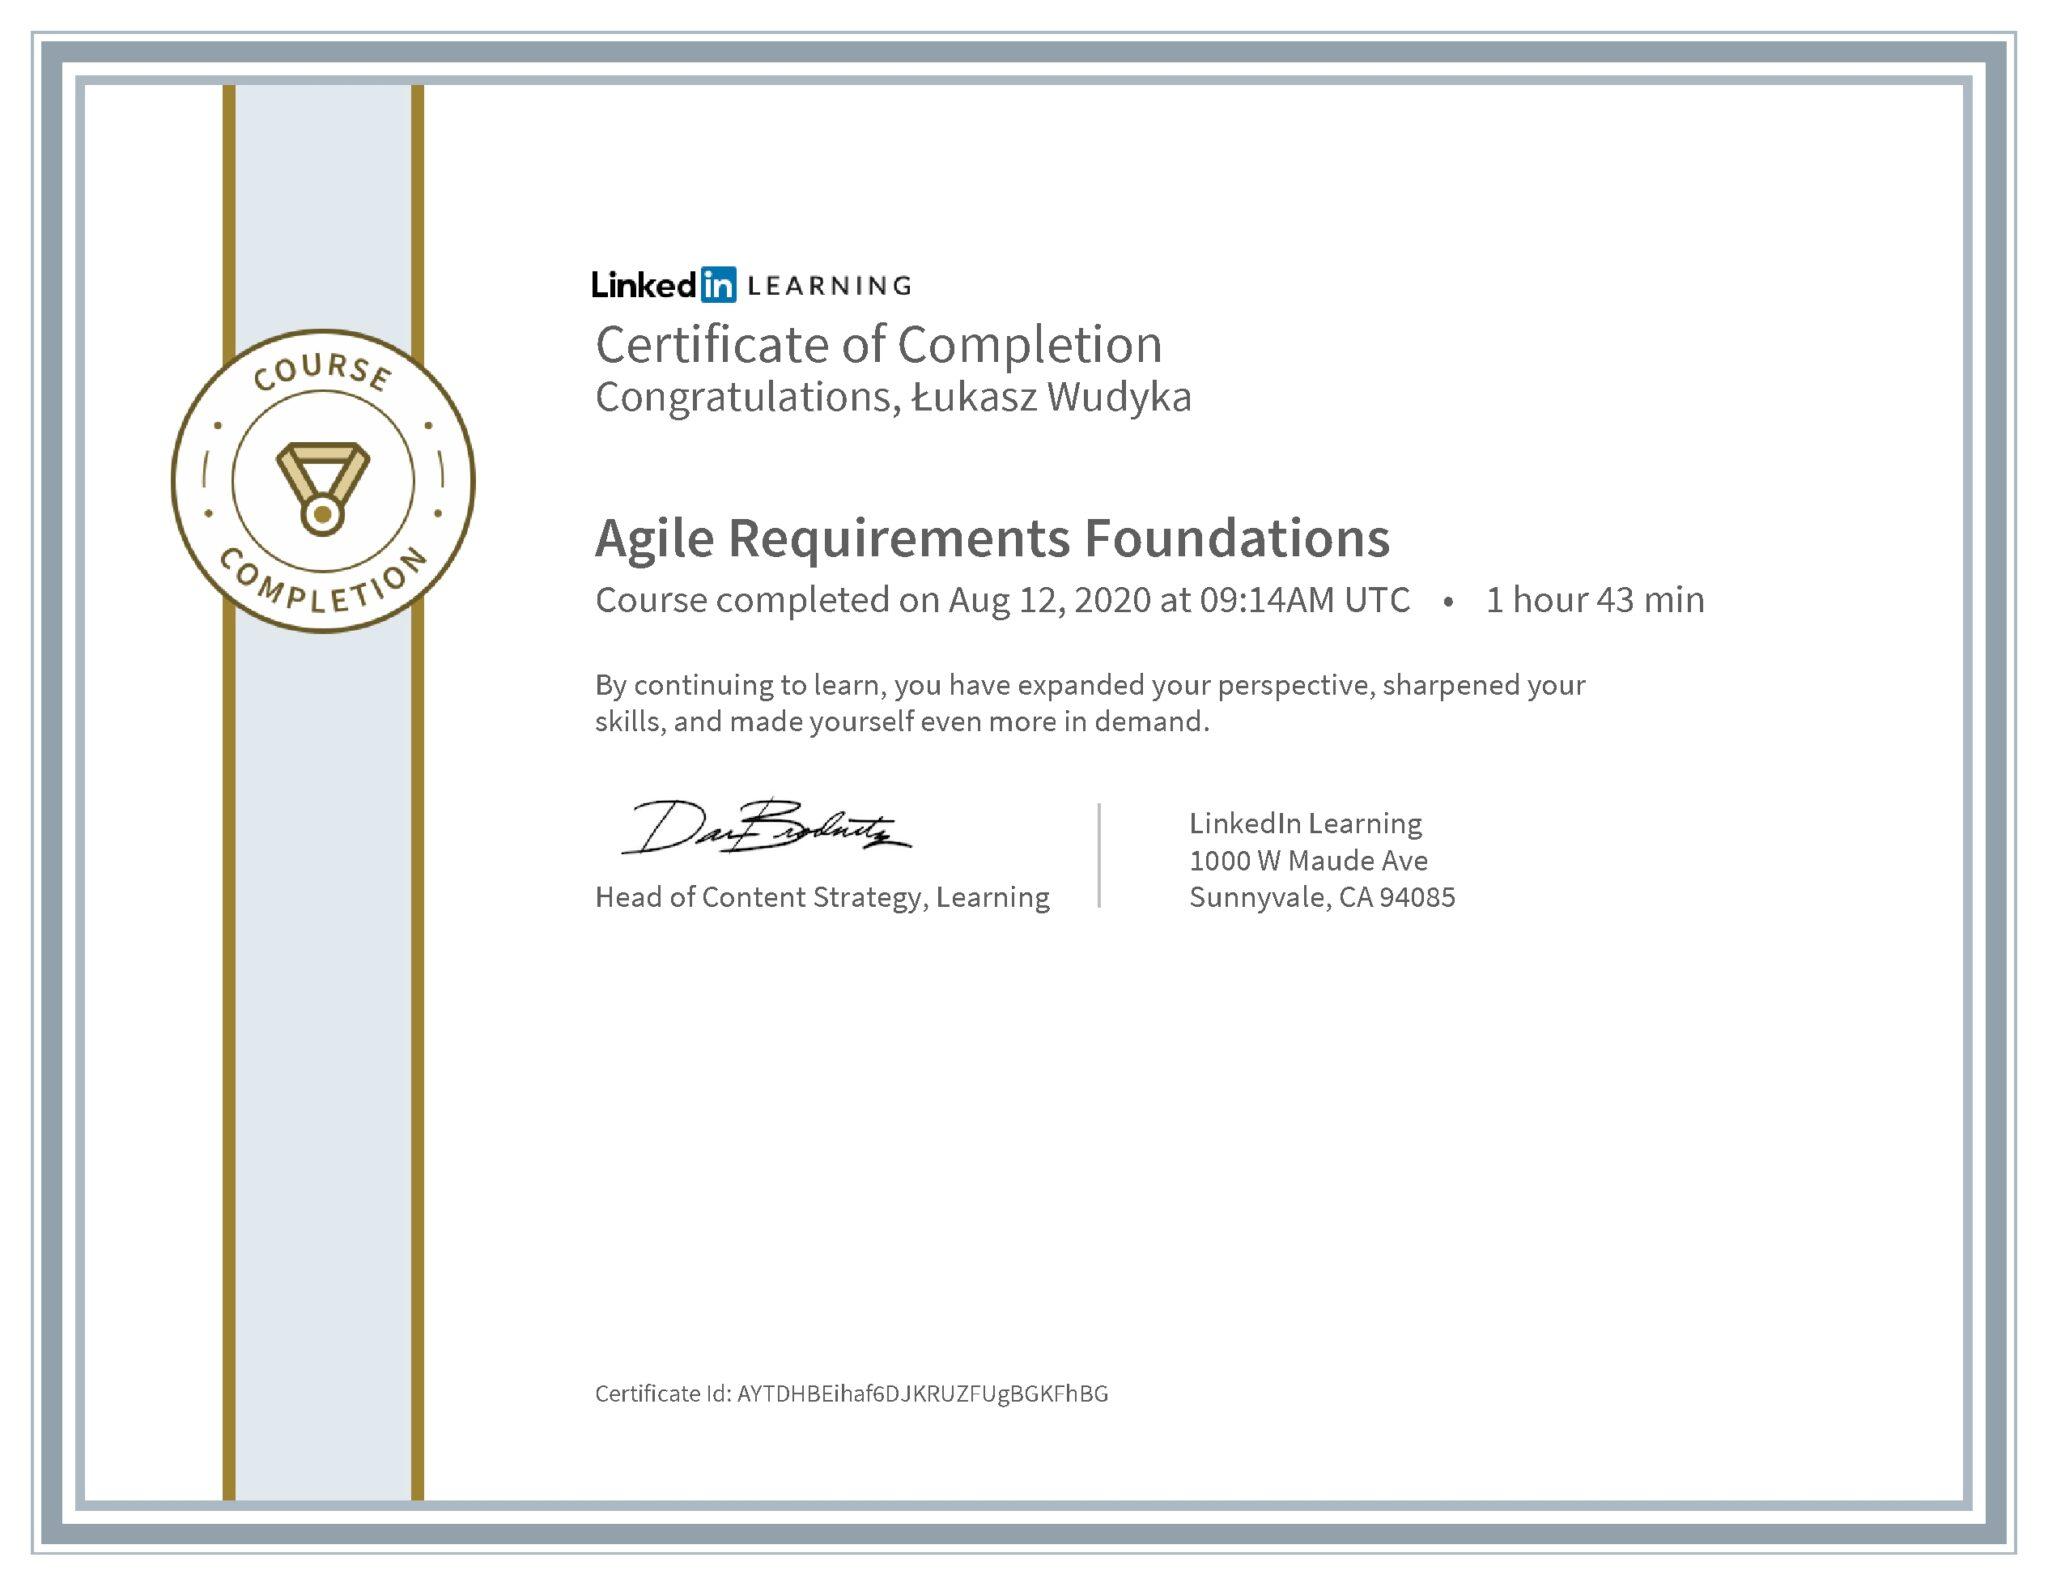 Łukasz Wudyka certyfikat LinkedIn Agile Requirements Foundations